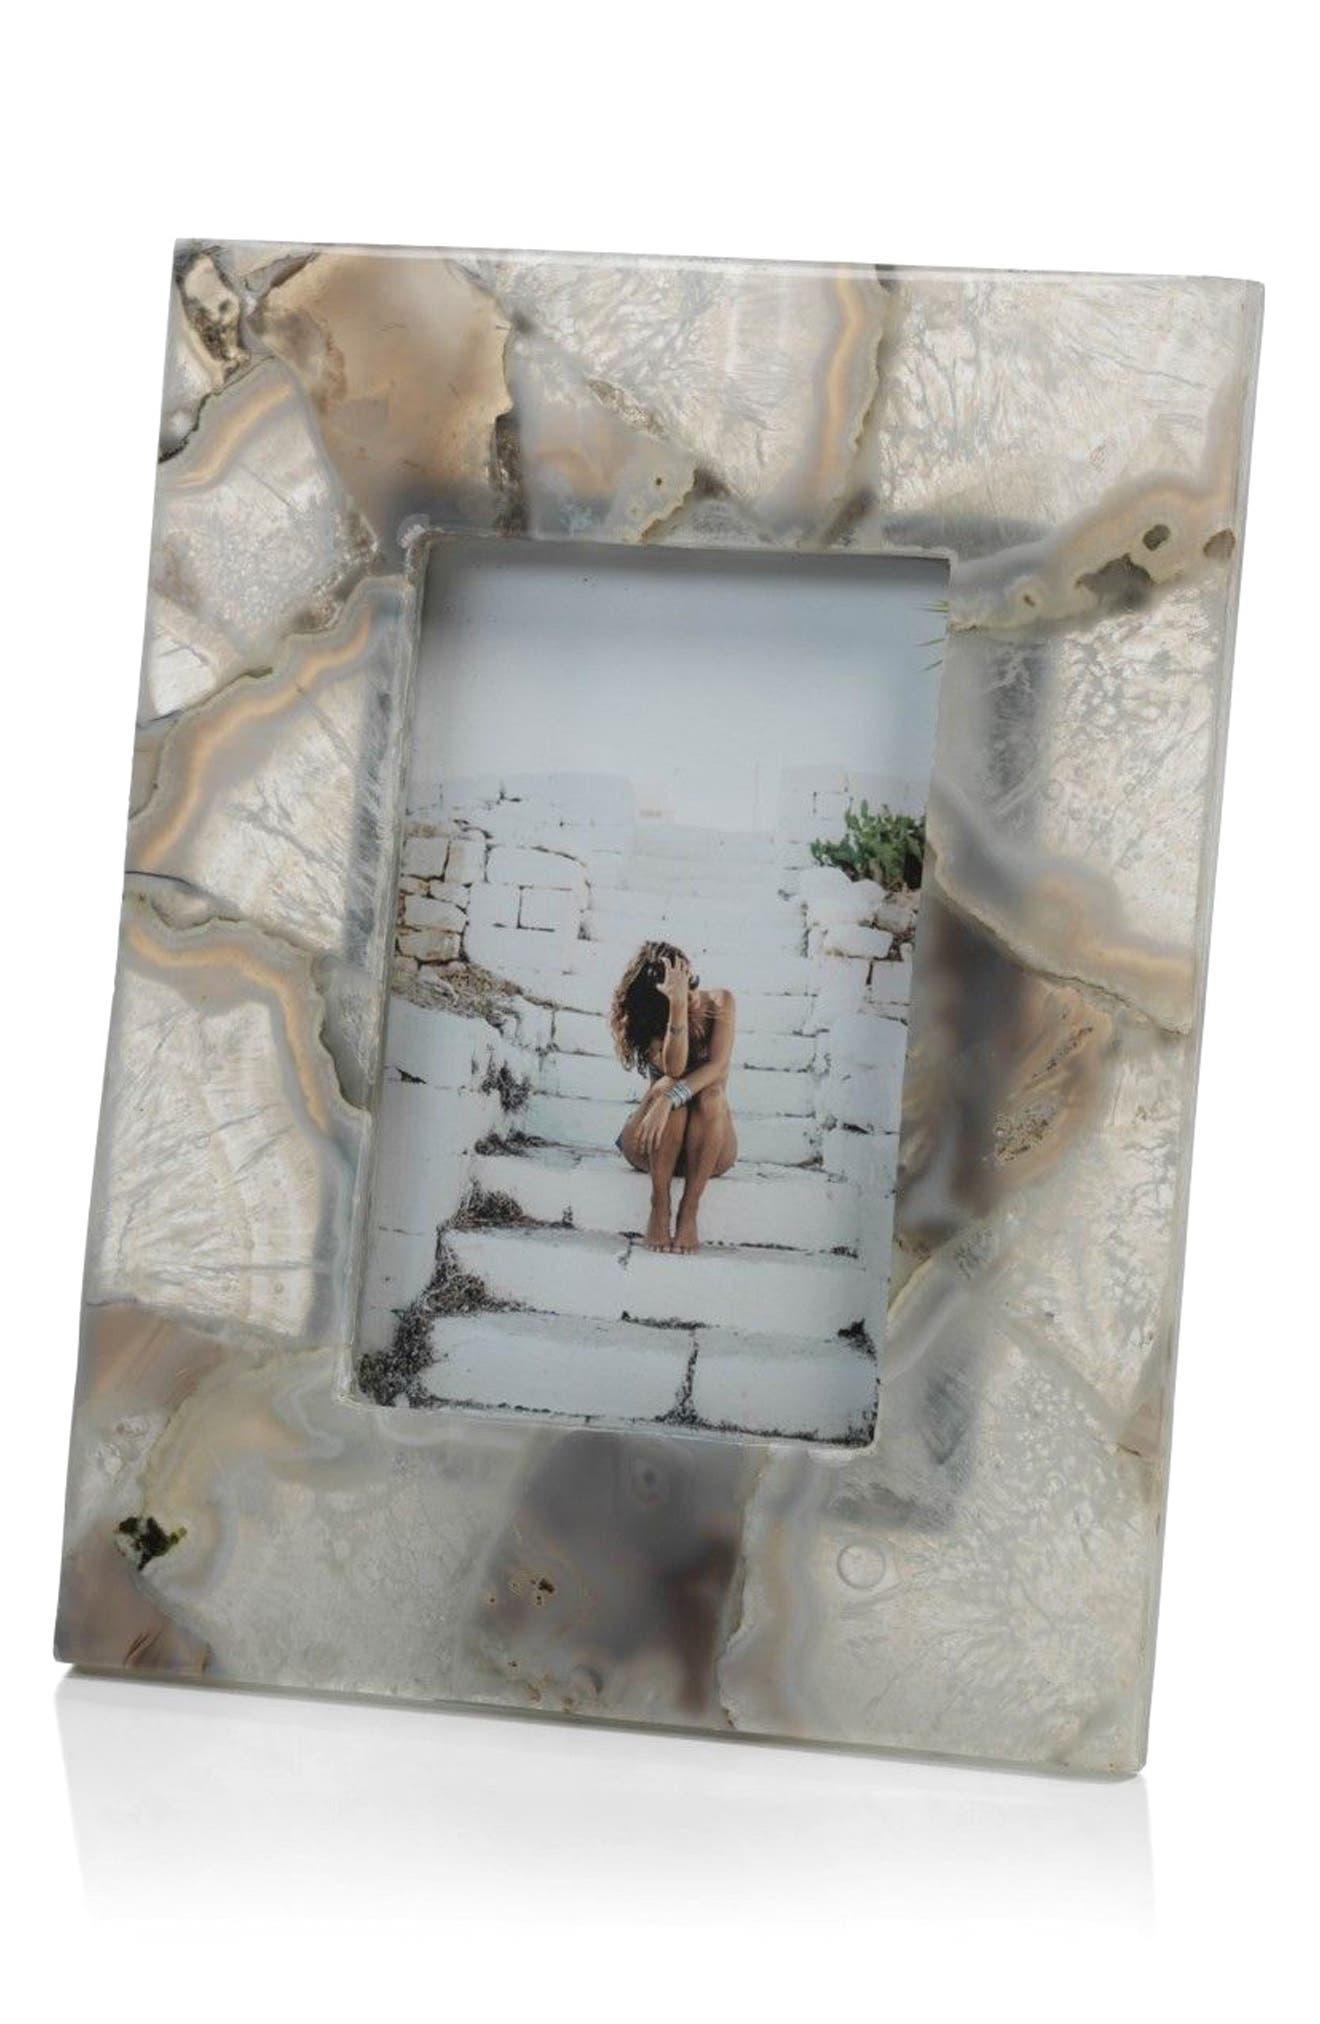 Alternate Image 1 Selected - Zodax Preto Agate Picture Frame